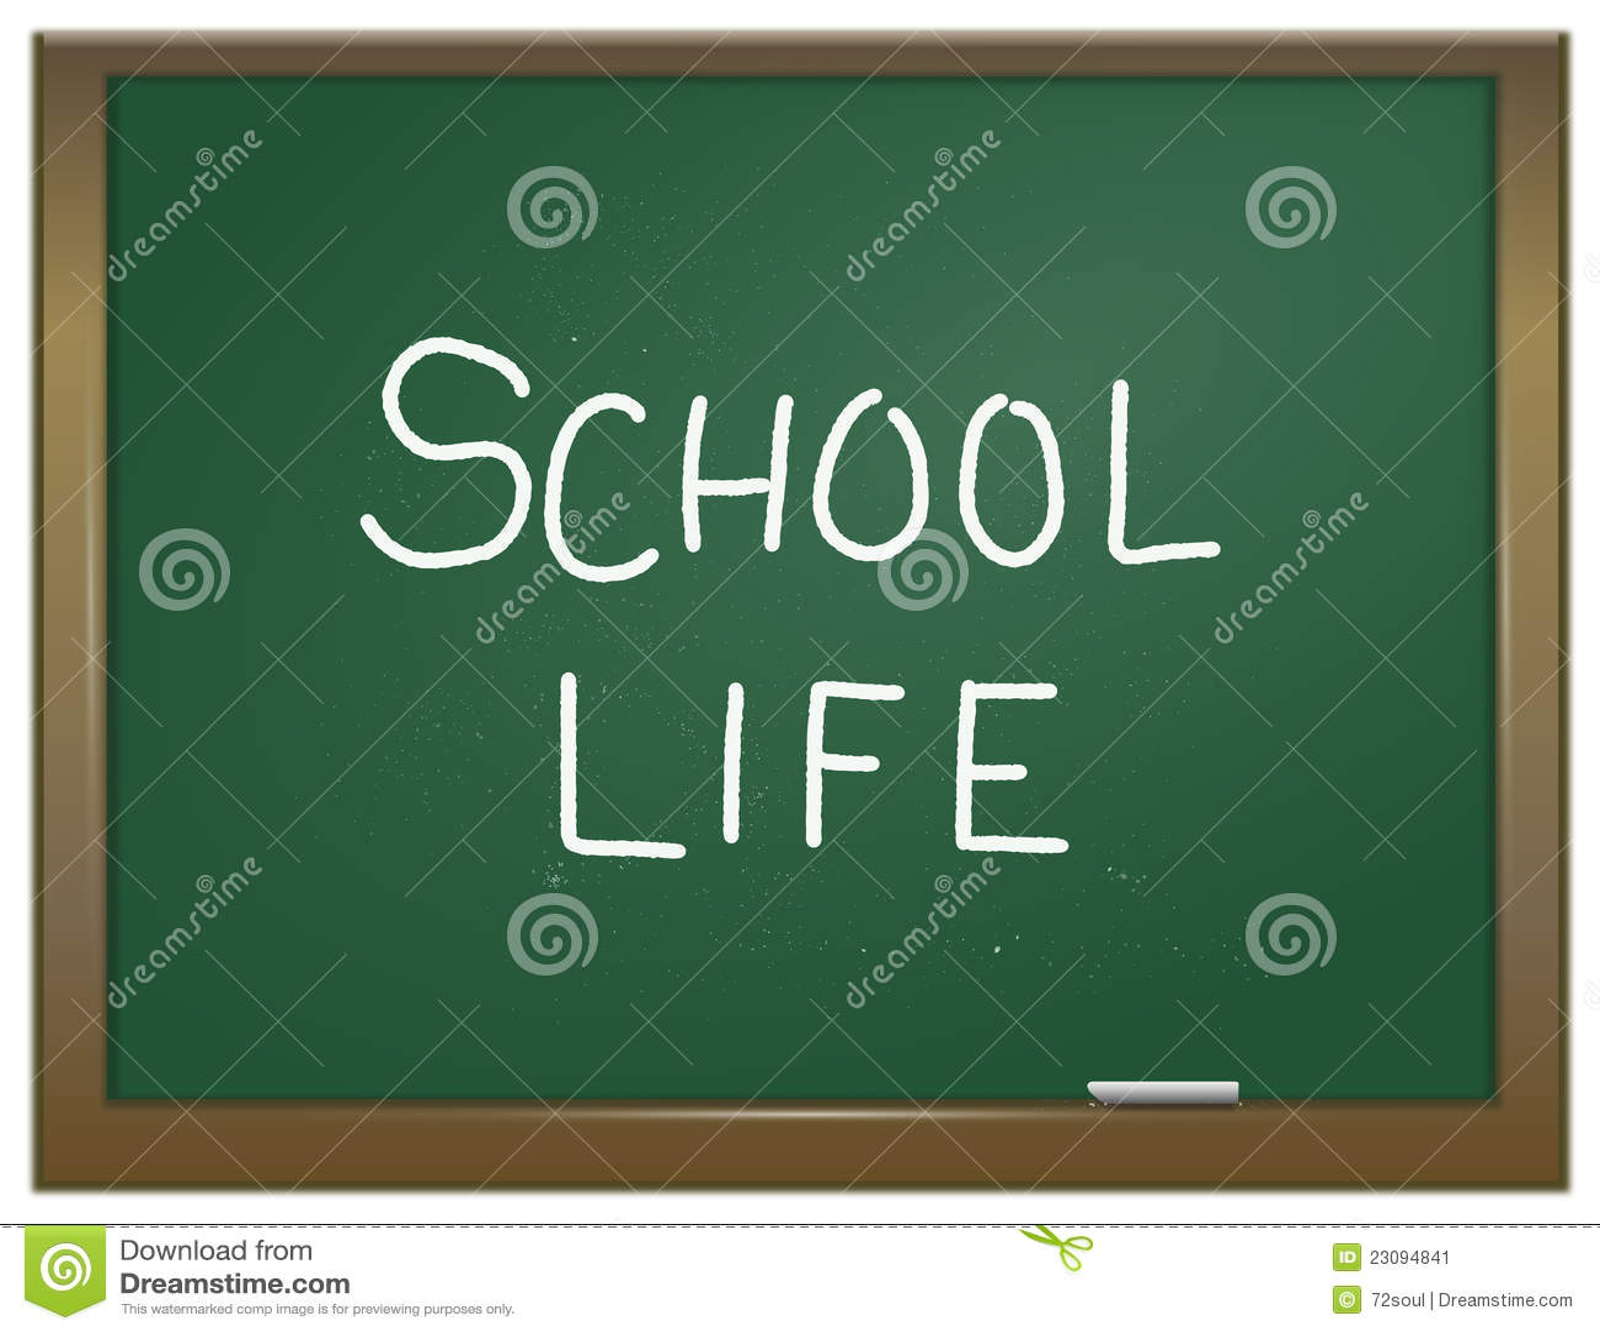 School life concept.